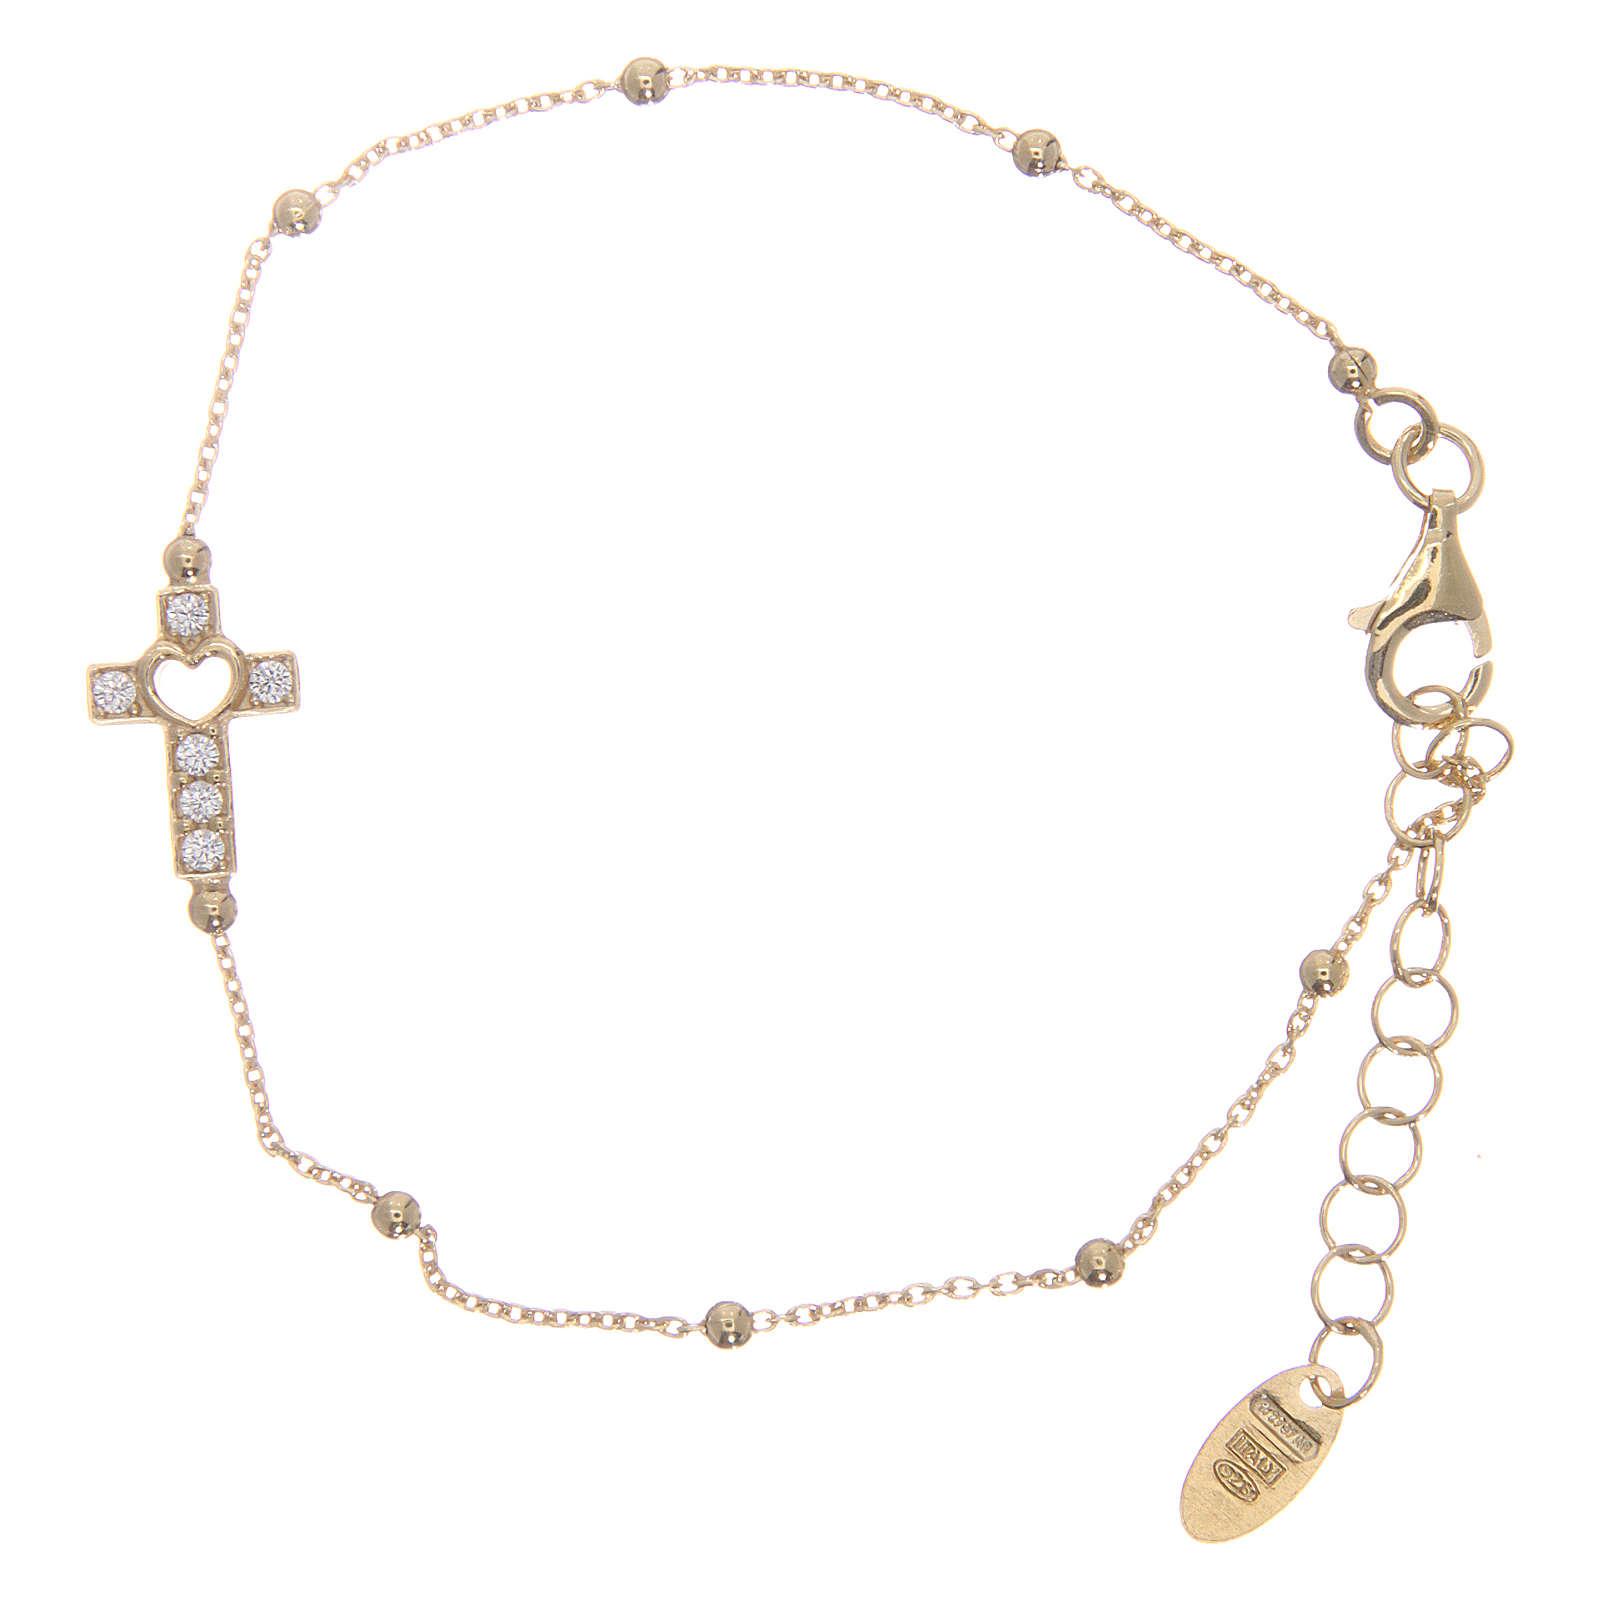 AMEN bracelet in golden 925 silver with white rhinestones 4